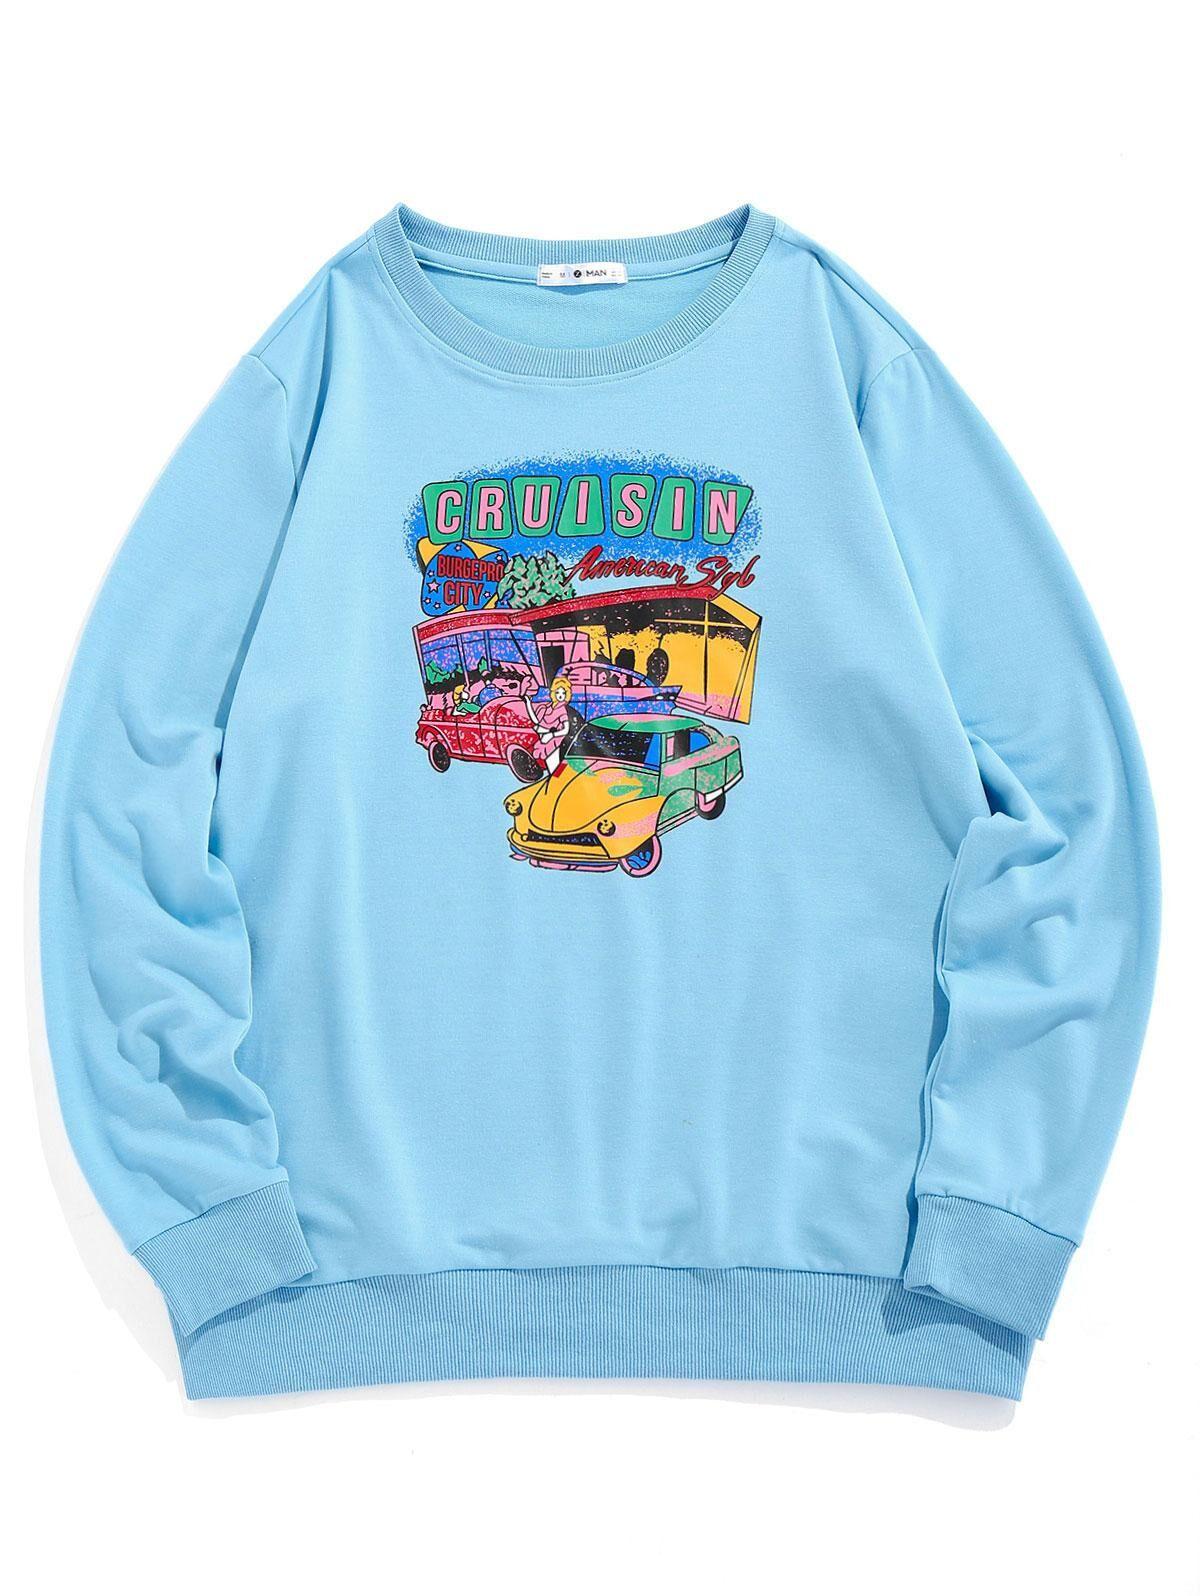 ZAFUL Cartoon Car Print Graphic Sweatshirt in LIGHT BLUE - Size: Large